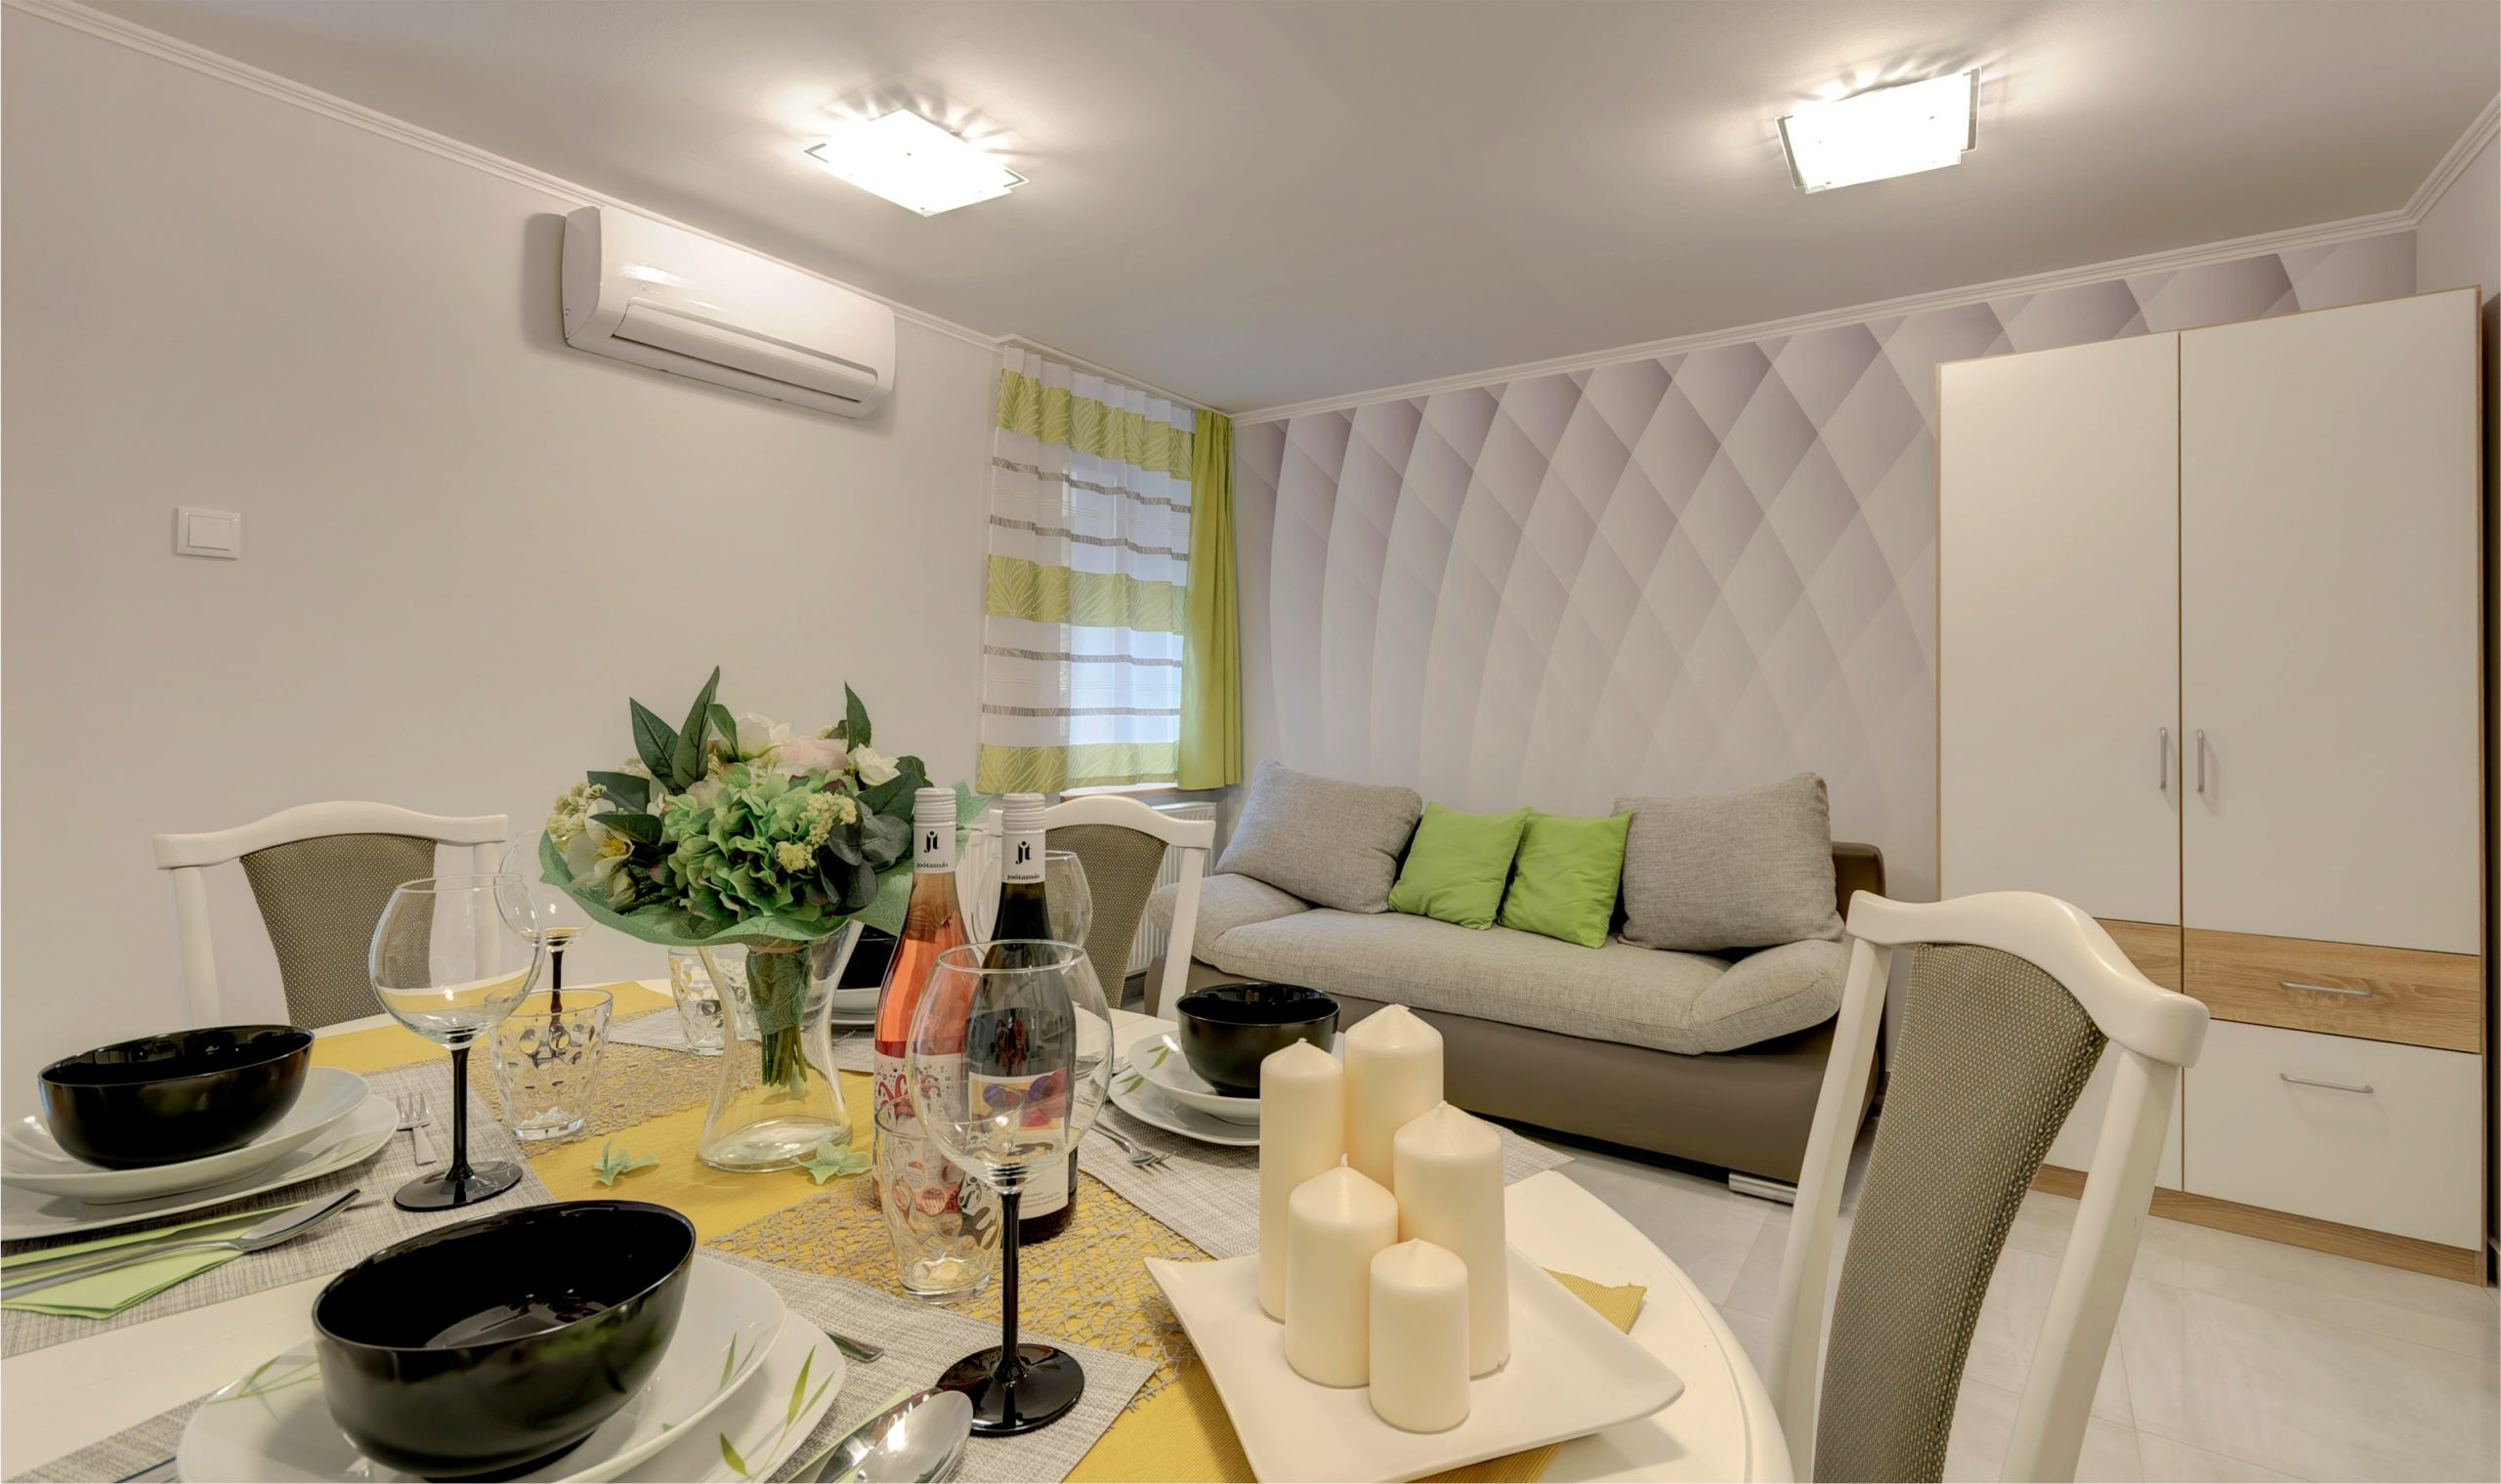 Udvari Apartman étkező nappali